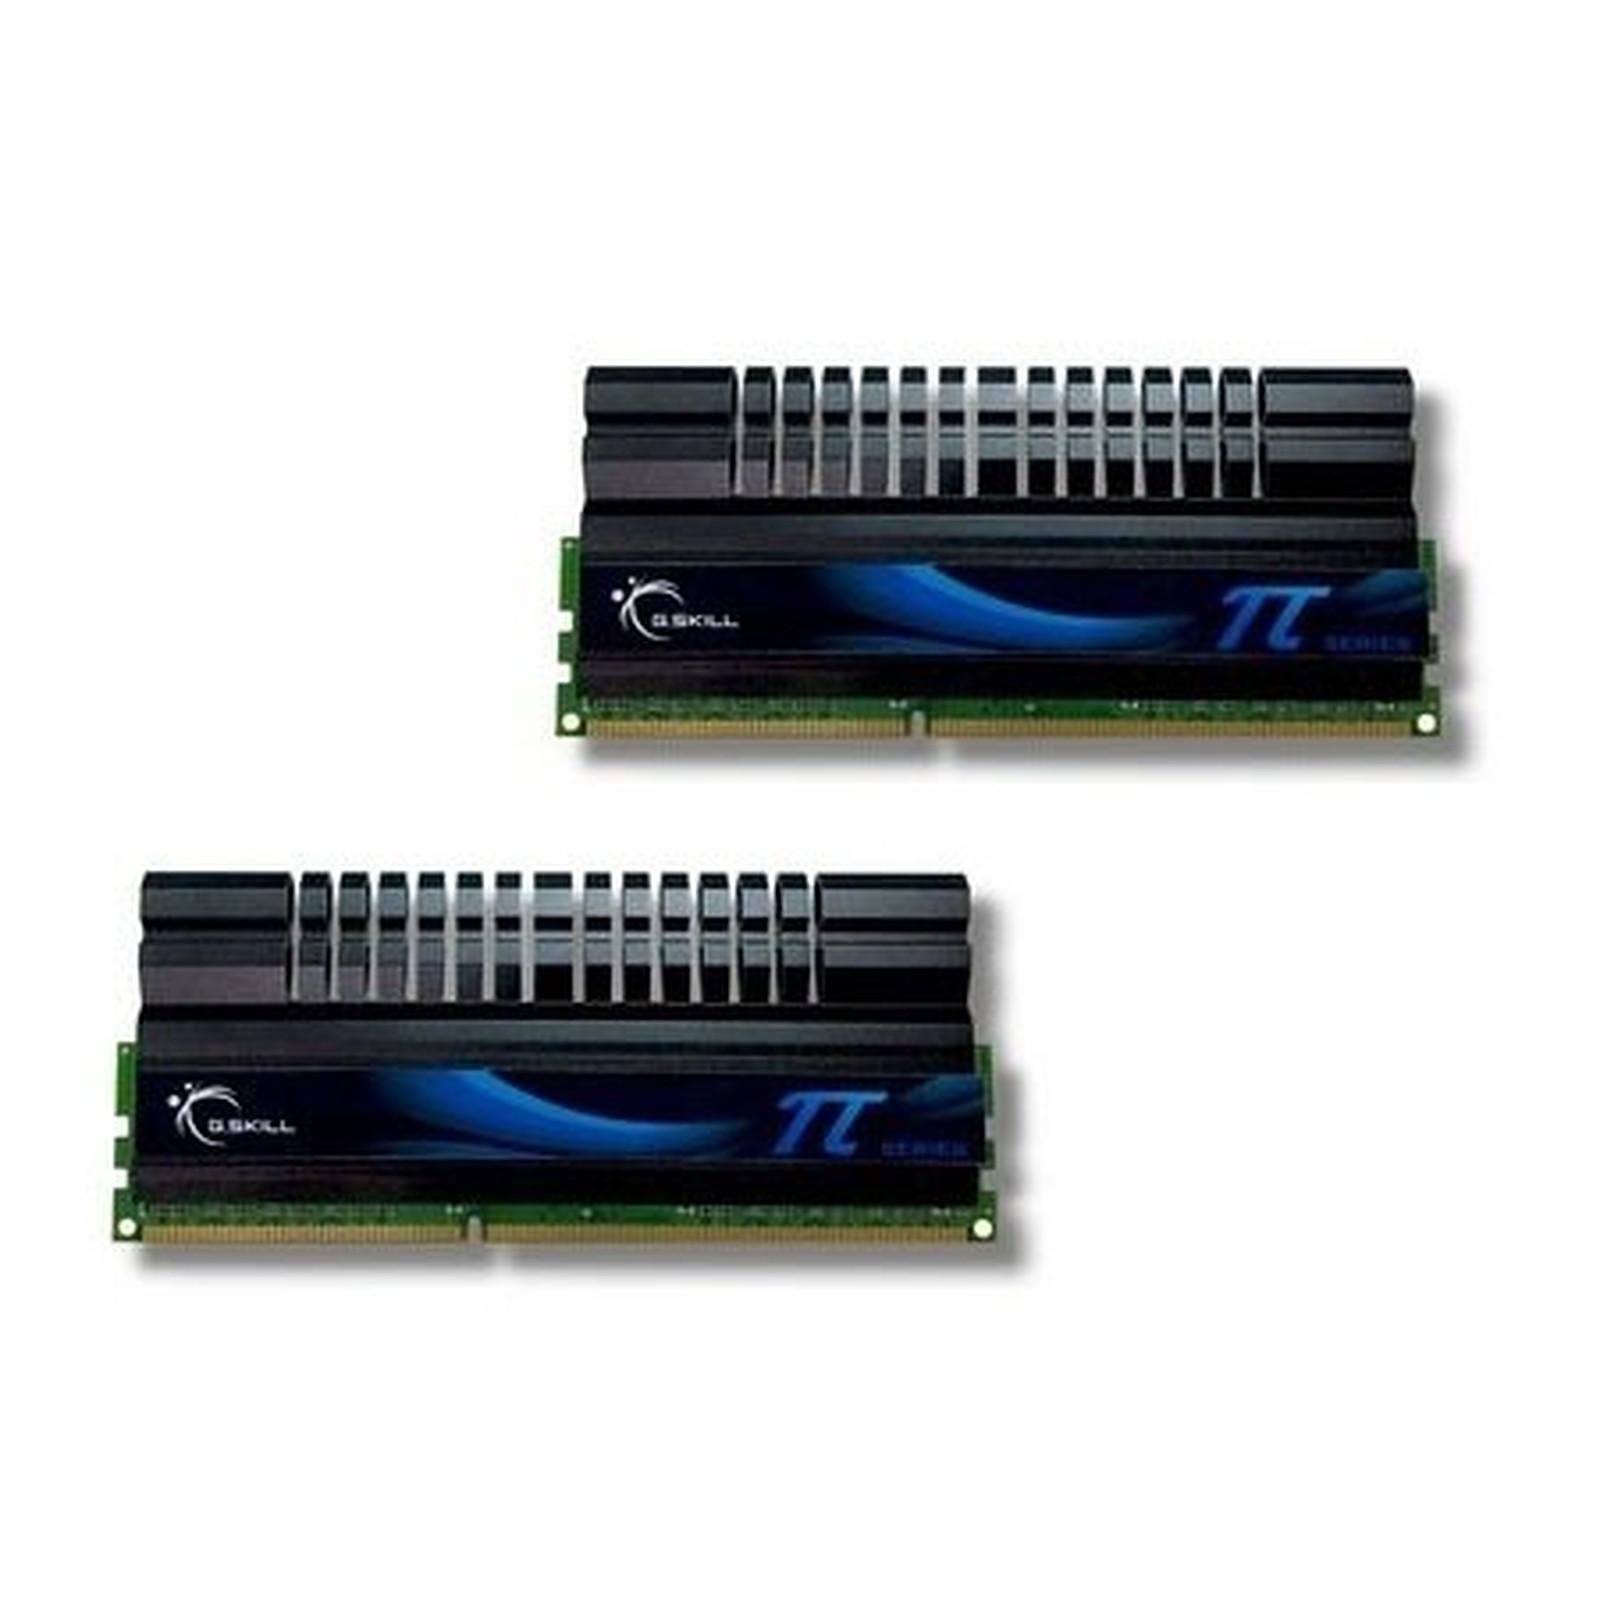 G.Skill Pi Series 4 Go (2x 2Go) DDR3 2133 MHz